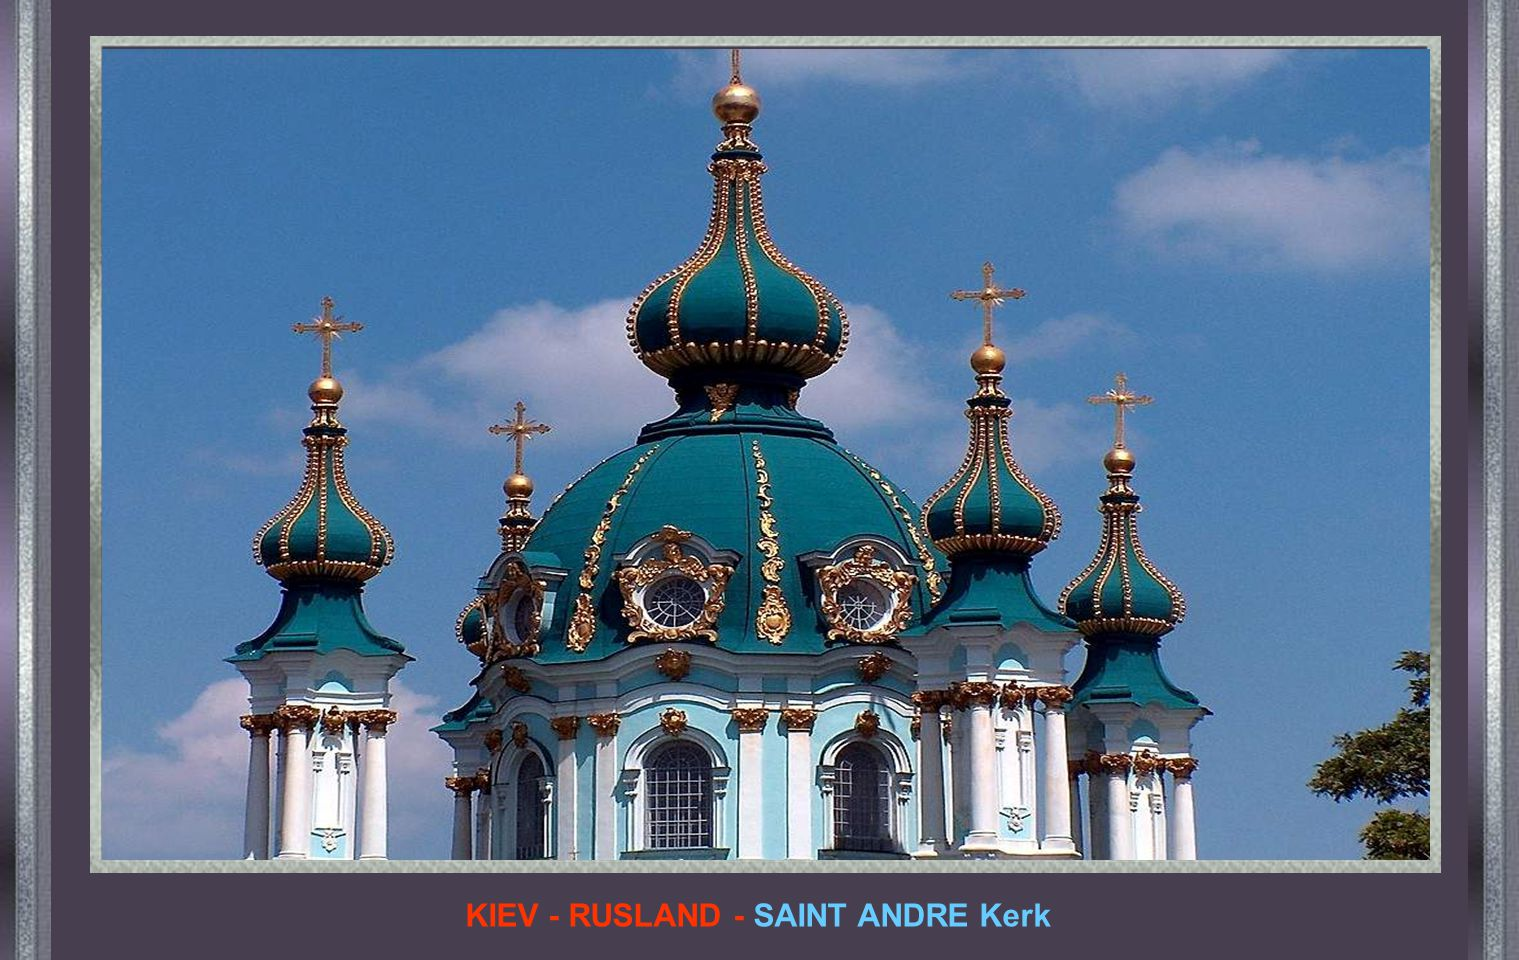 KIEV - RUSLAND - SAINT ANDRE Kerk